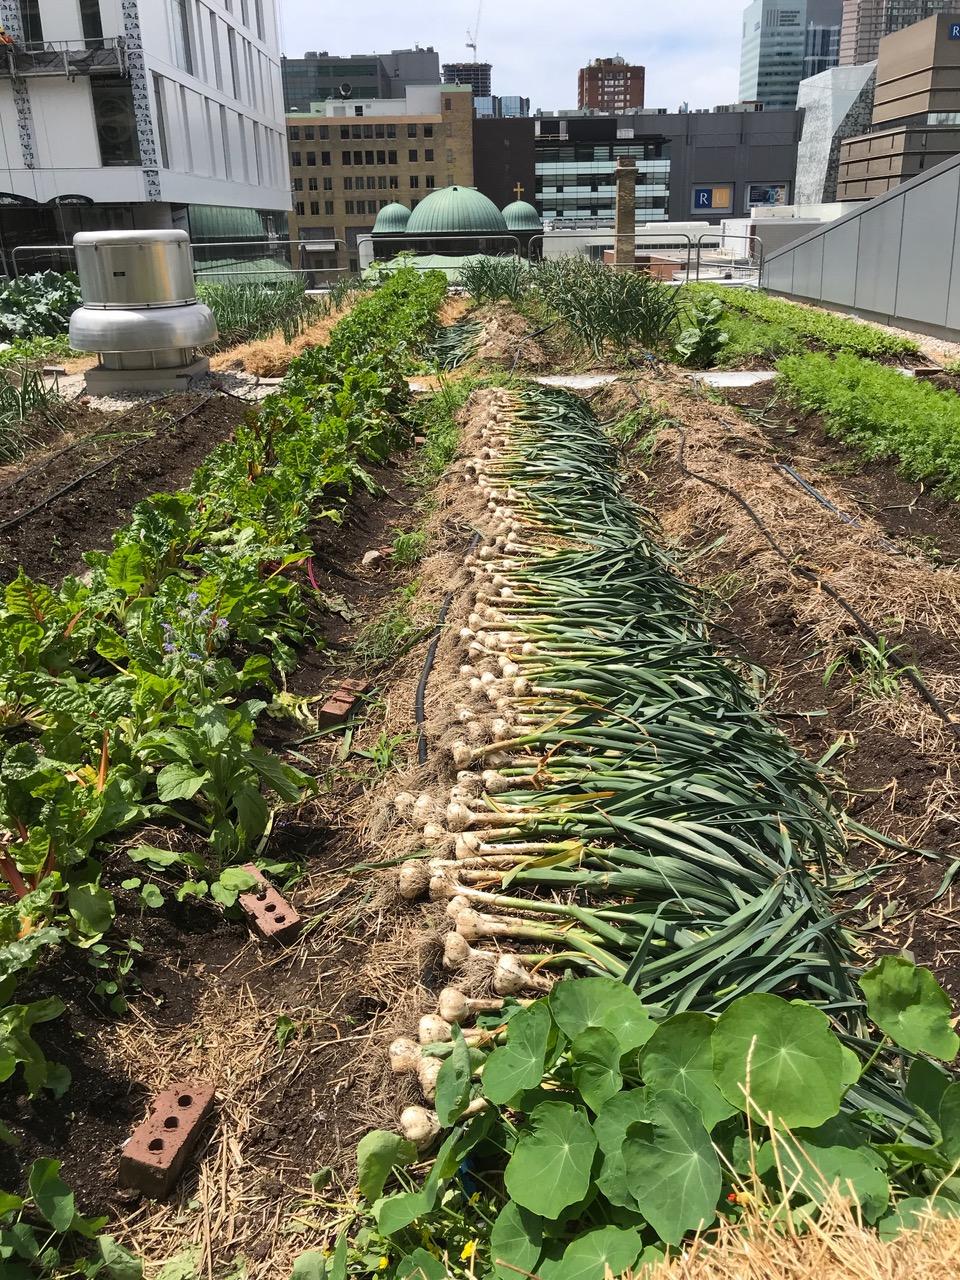 Ryerson green roof